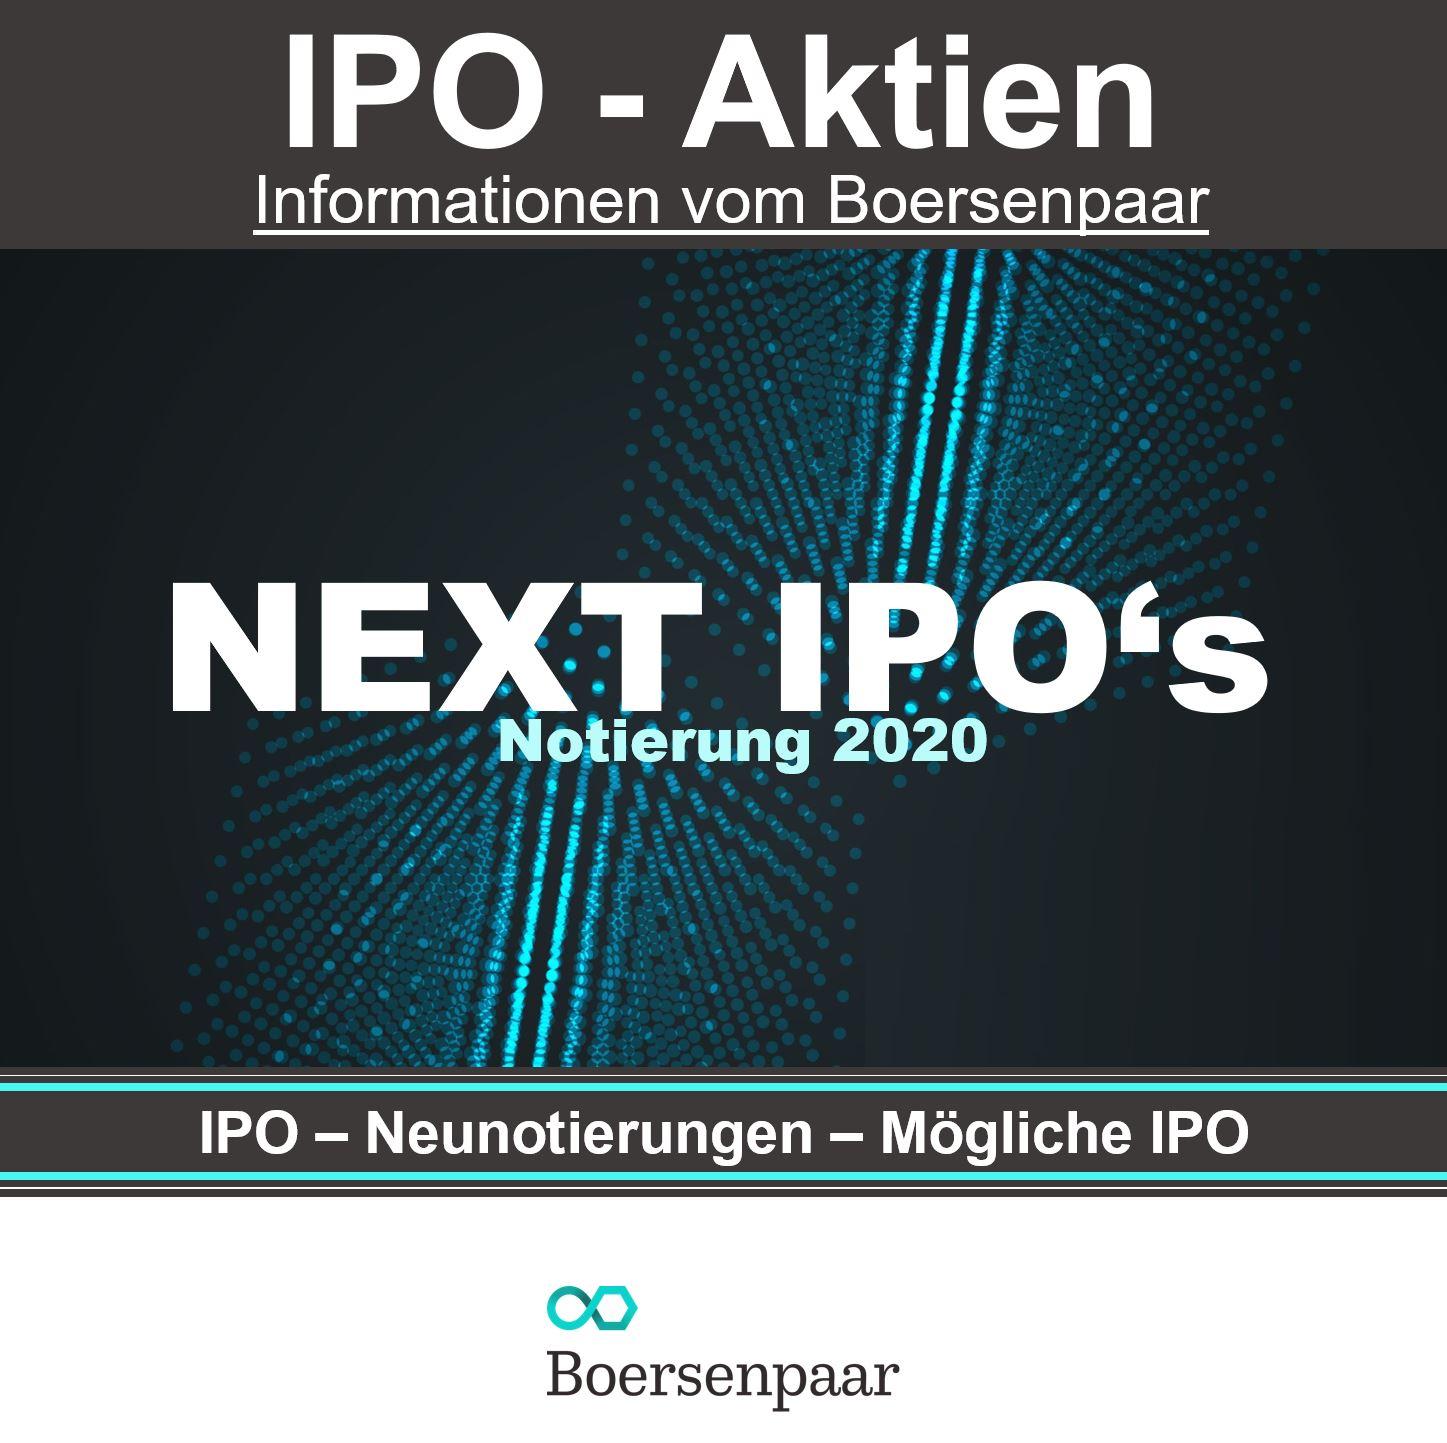 IPO Aktien